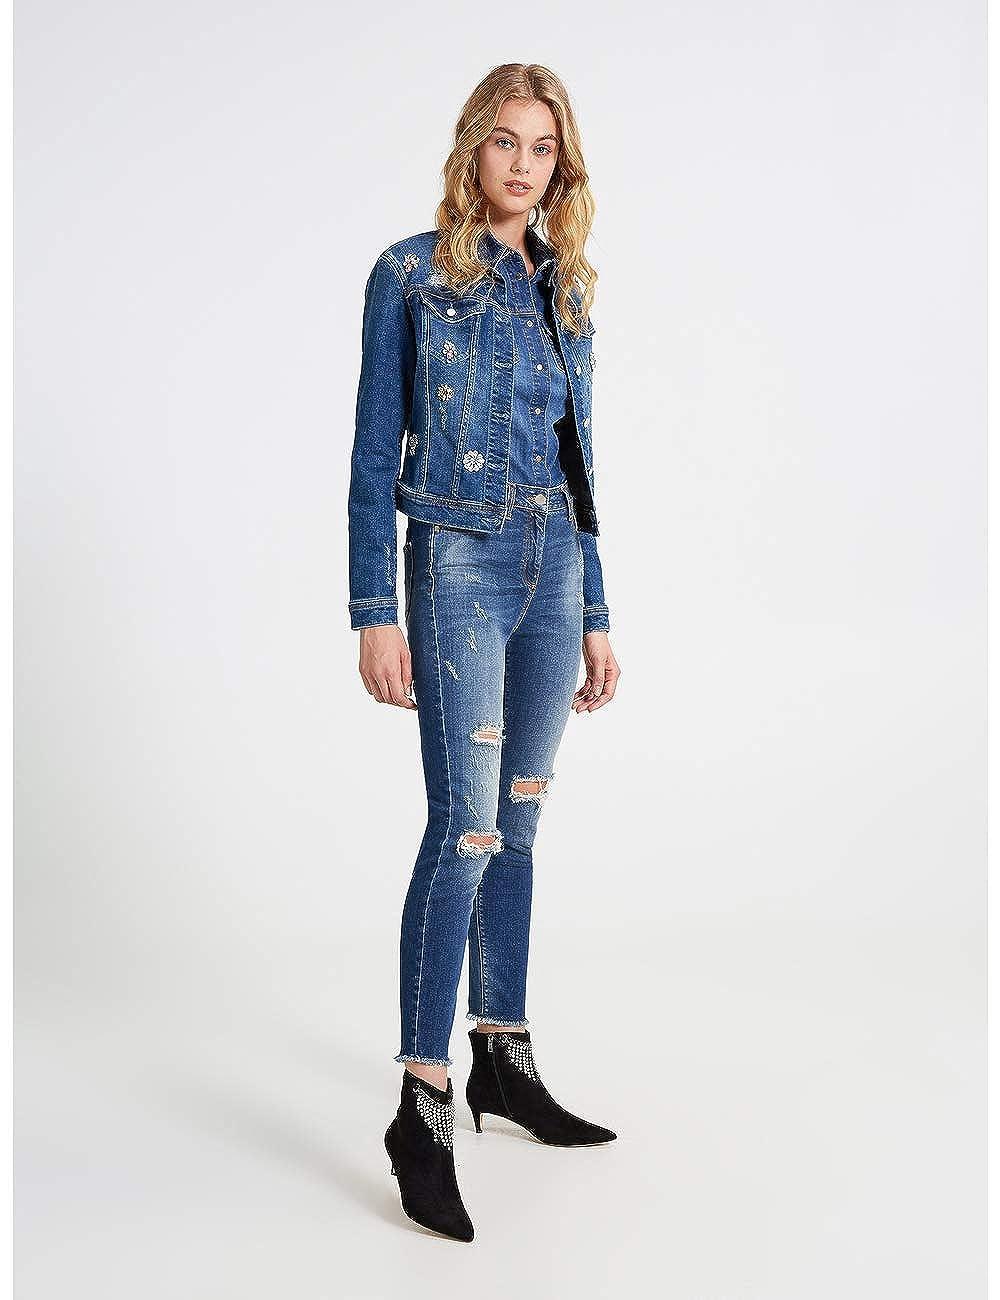 Italian Size Motivi Jeans Skinny a Vita Alta Modello Gisele